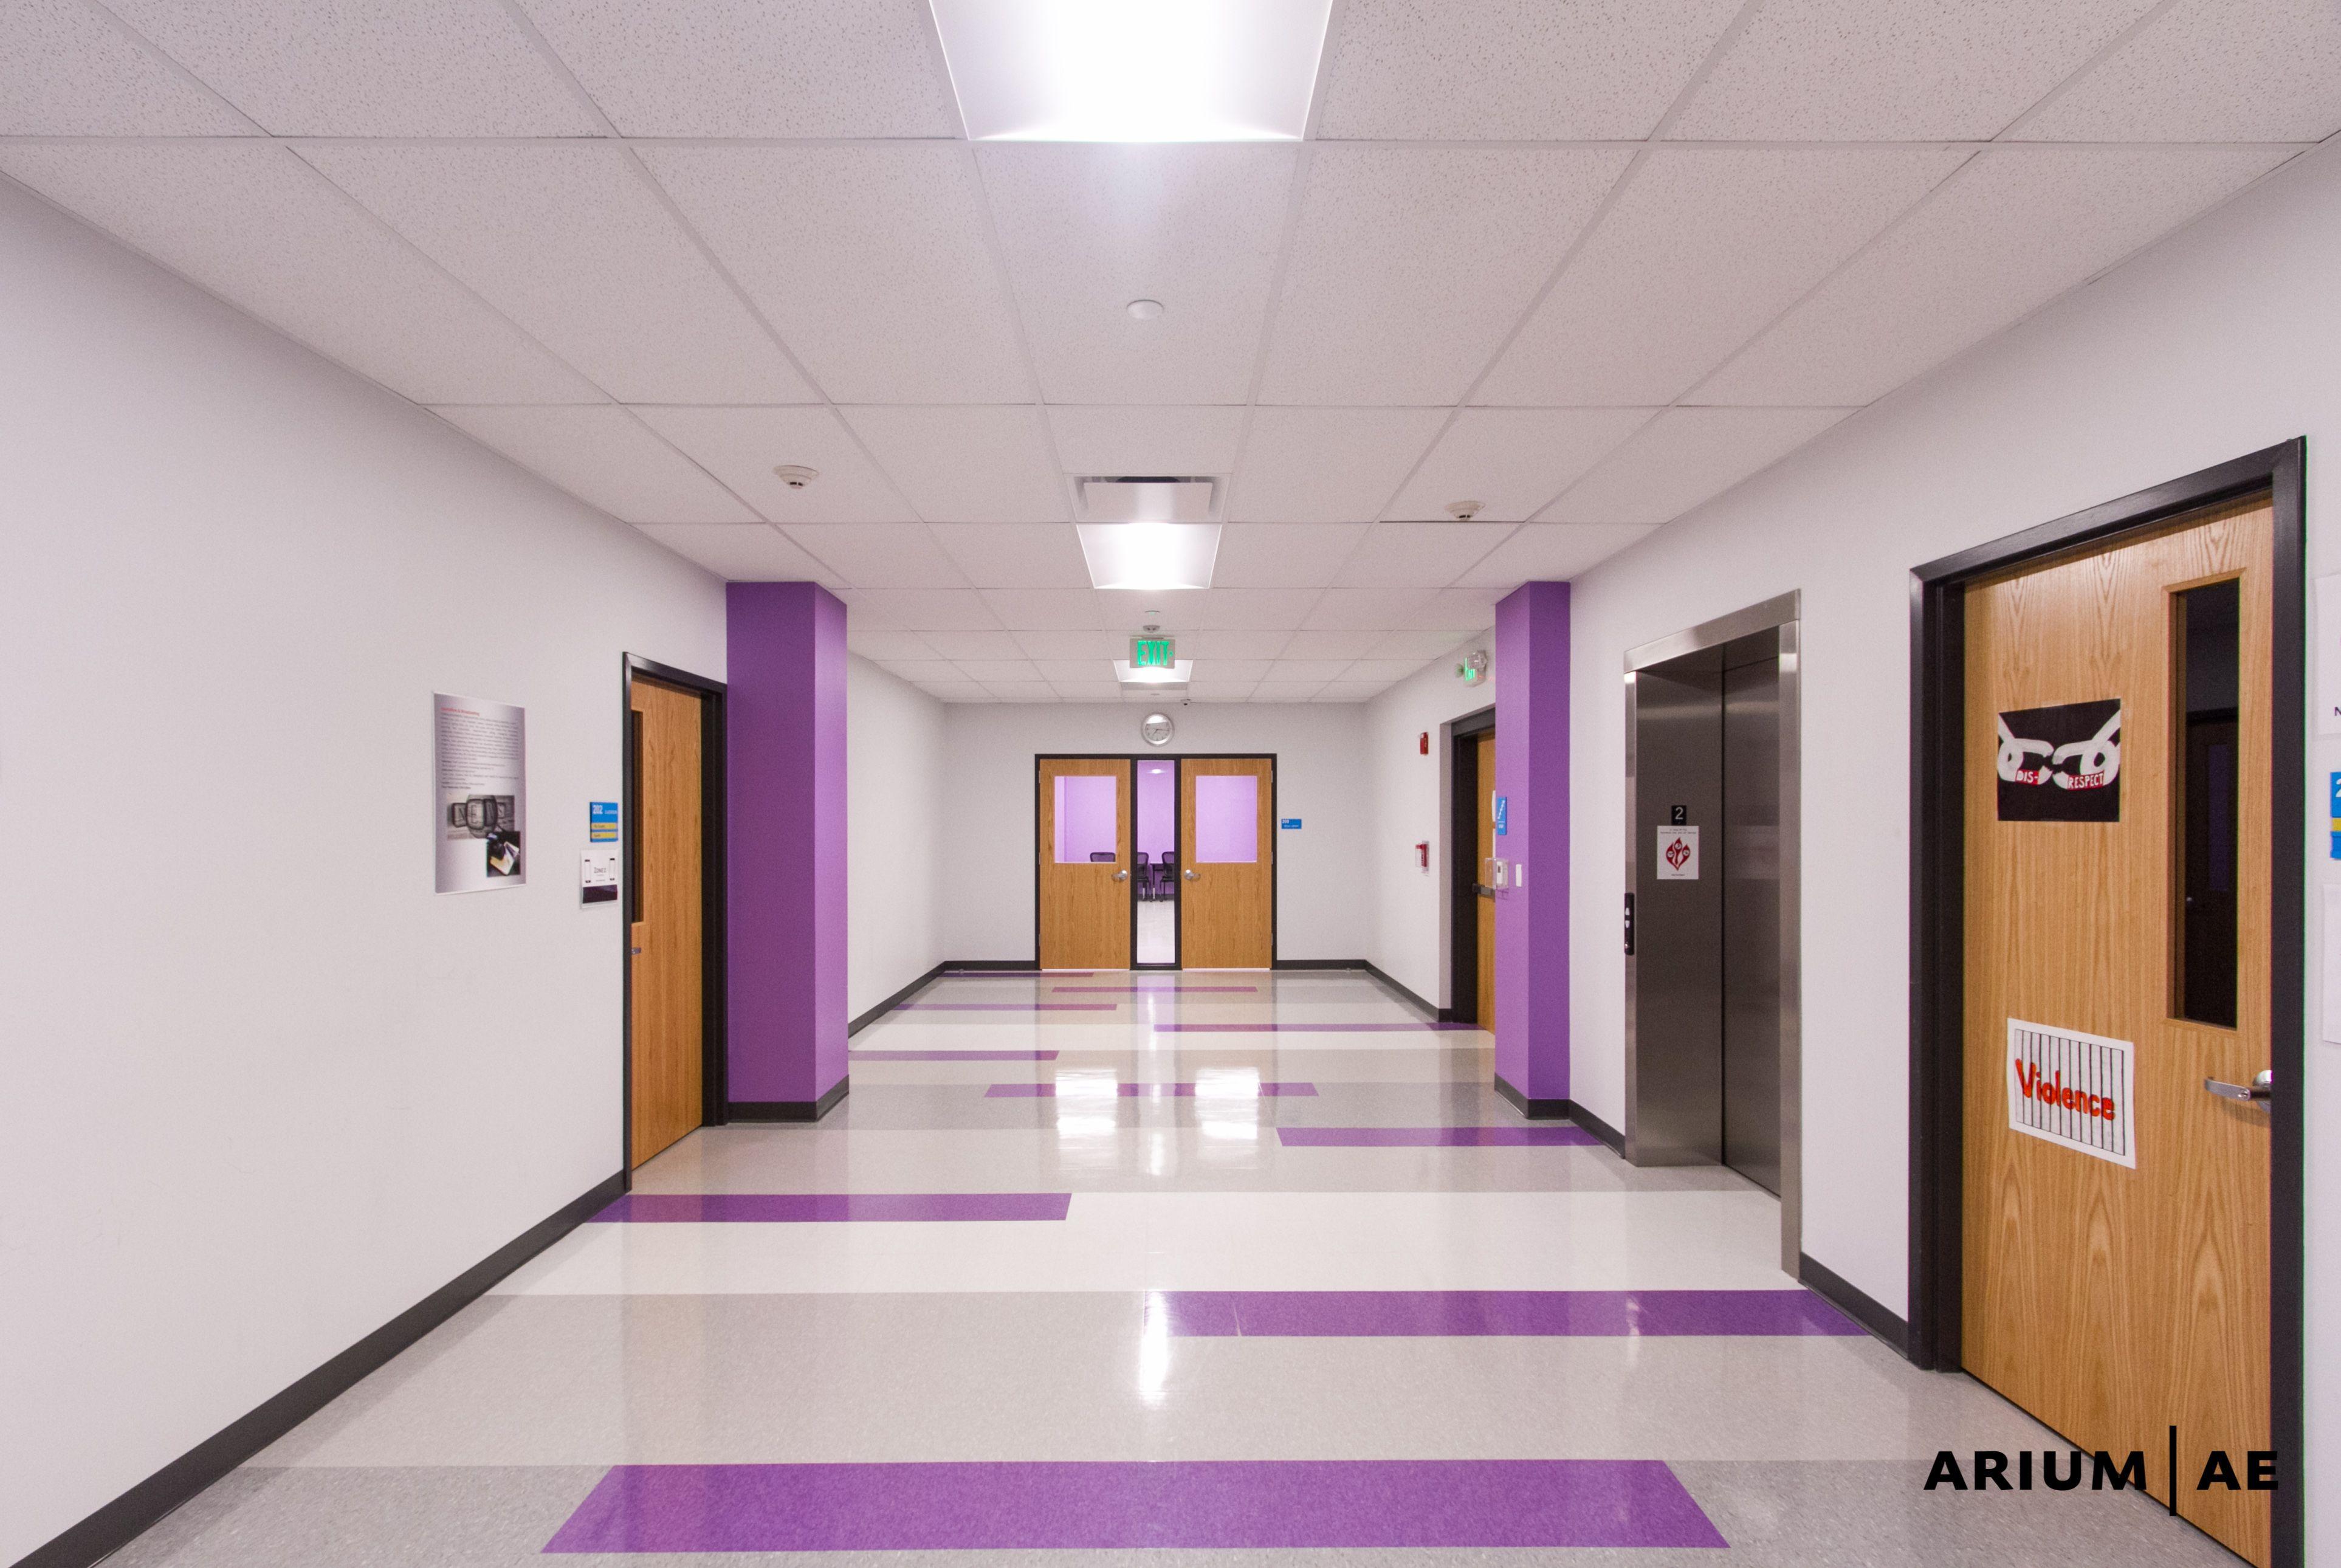 High School Hallway Accent Color Floor Accent Pattern